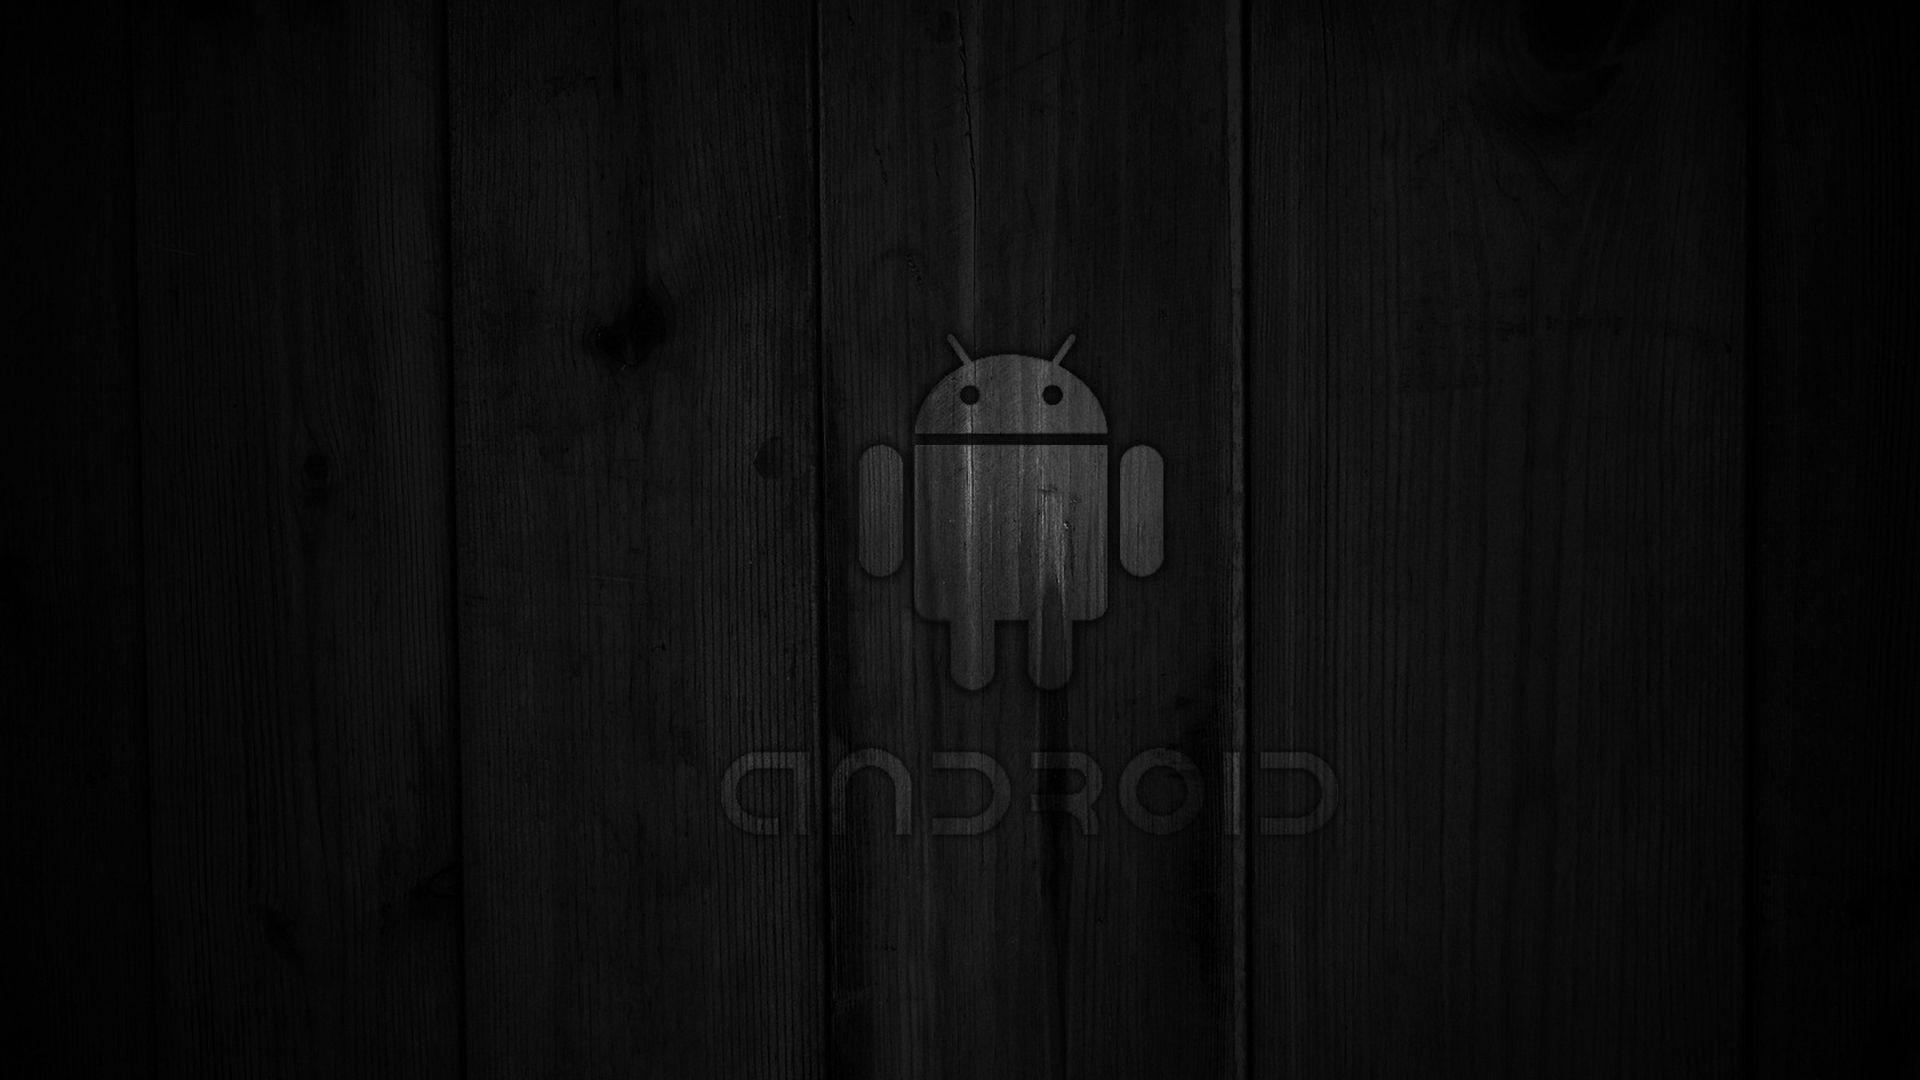 Res: 1920x1080, Wallpaper Dark Android Hd Superman Wallpaper